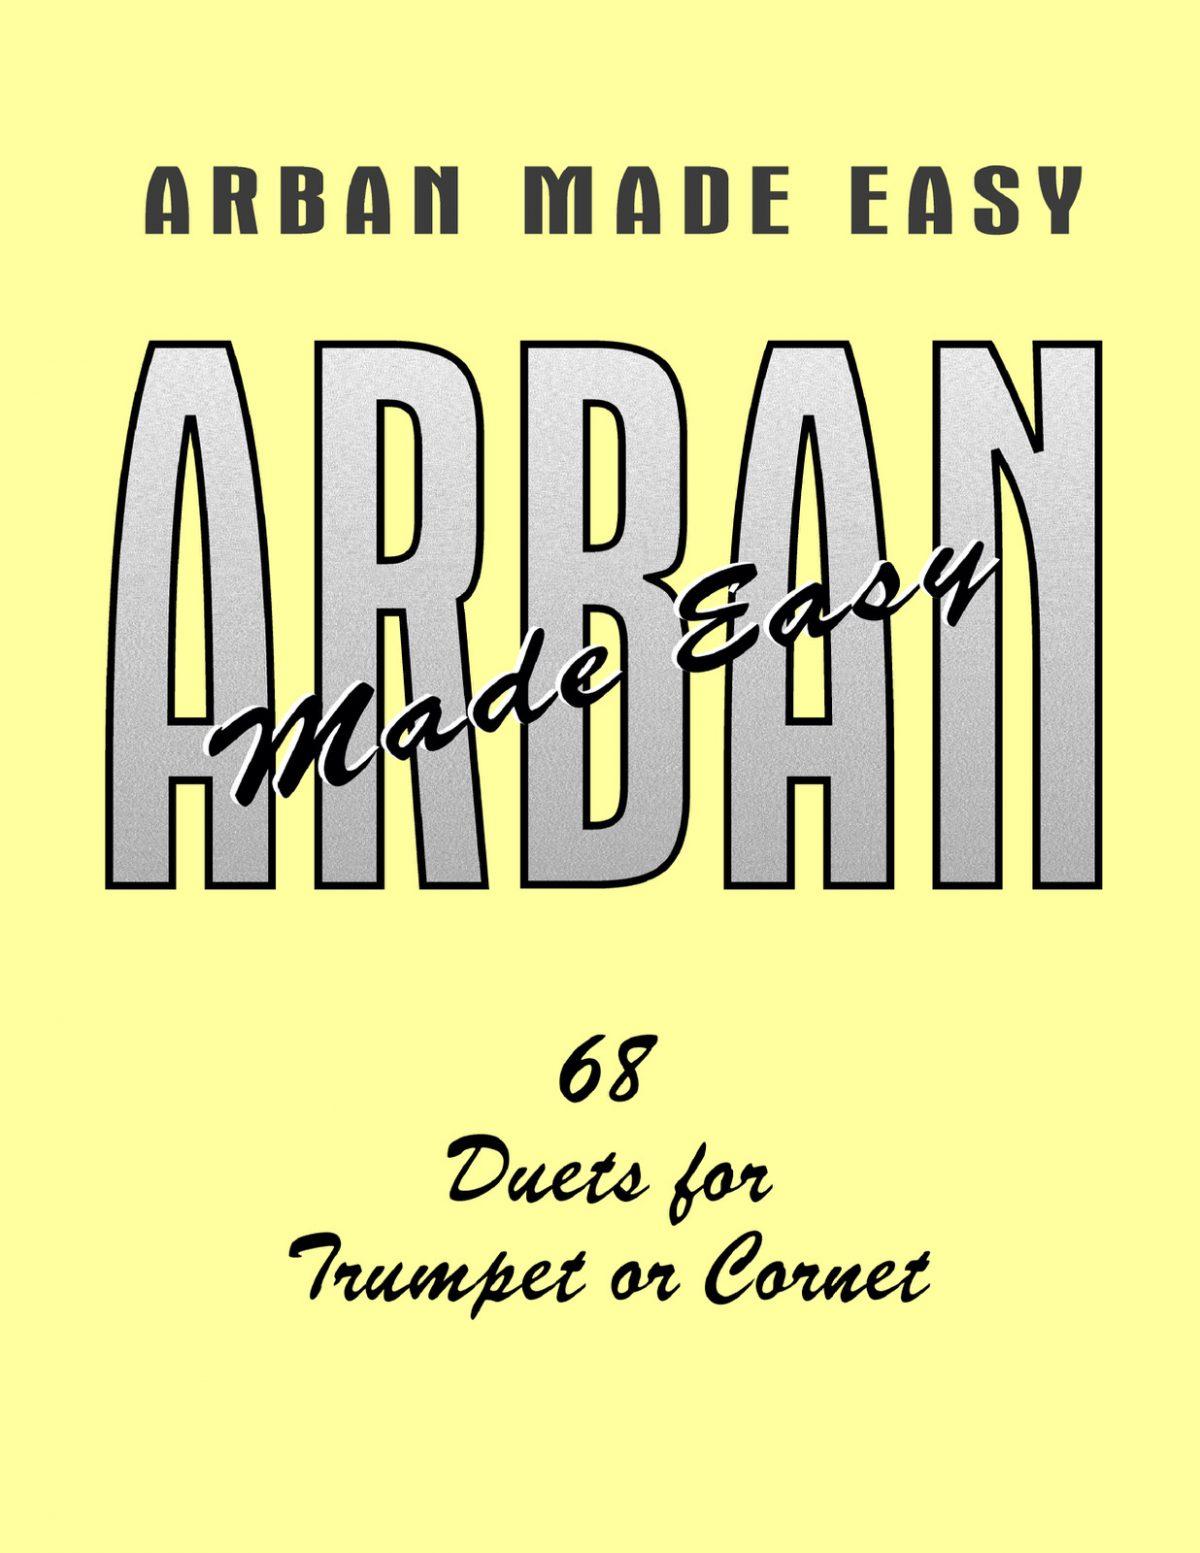 Arban, Arban Duets Made Easy